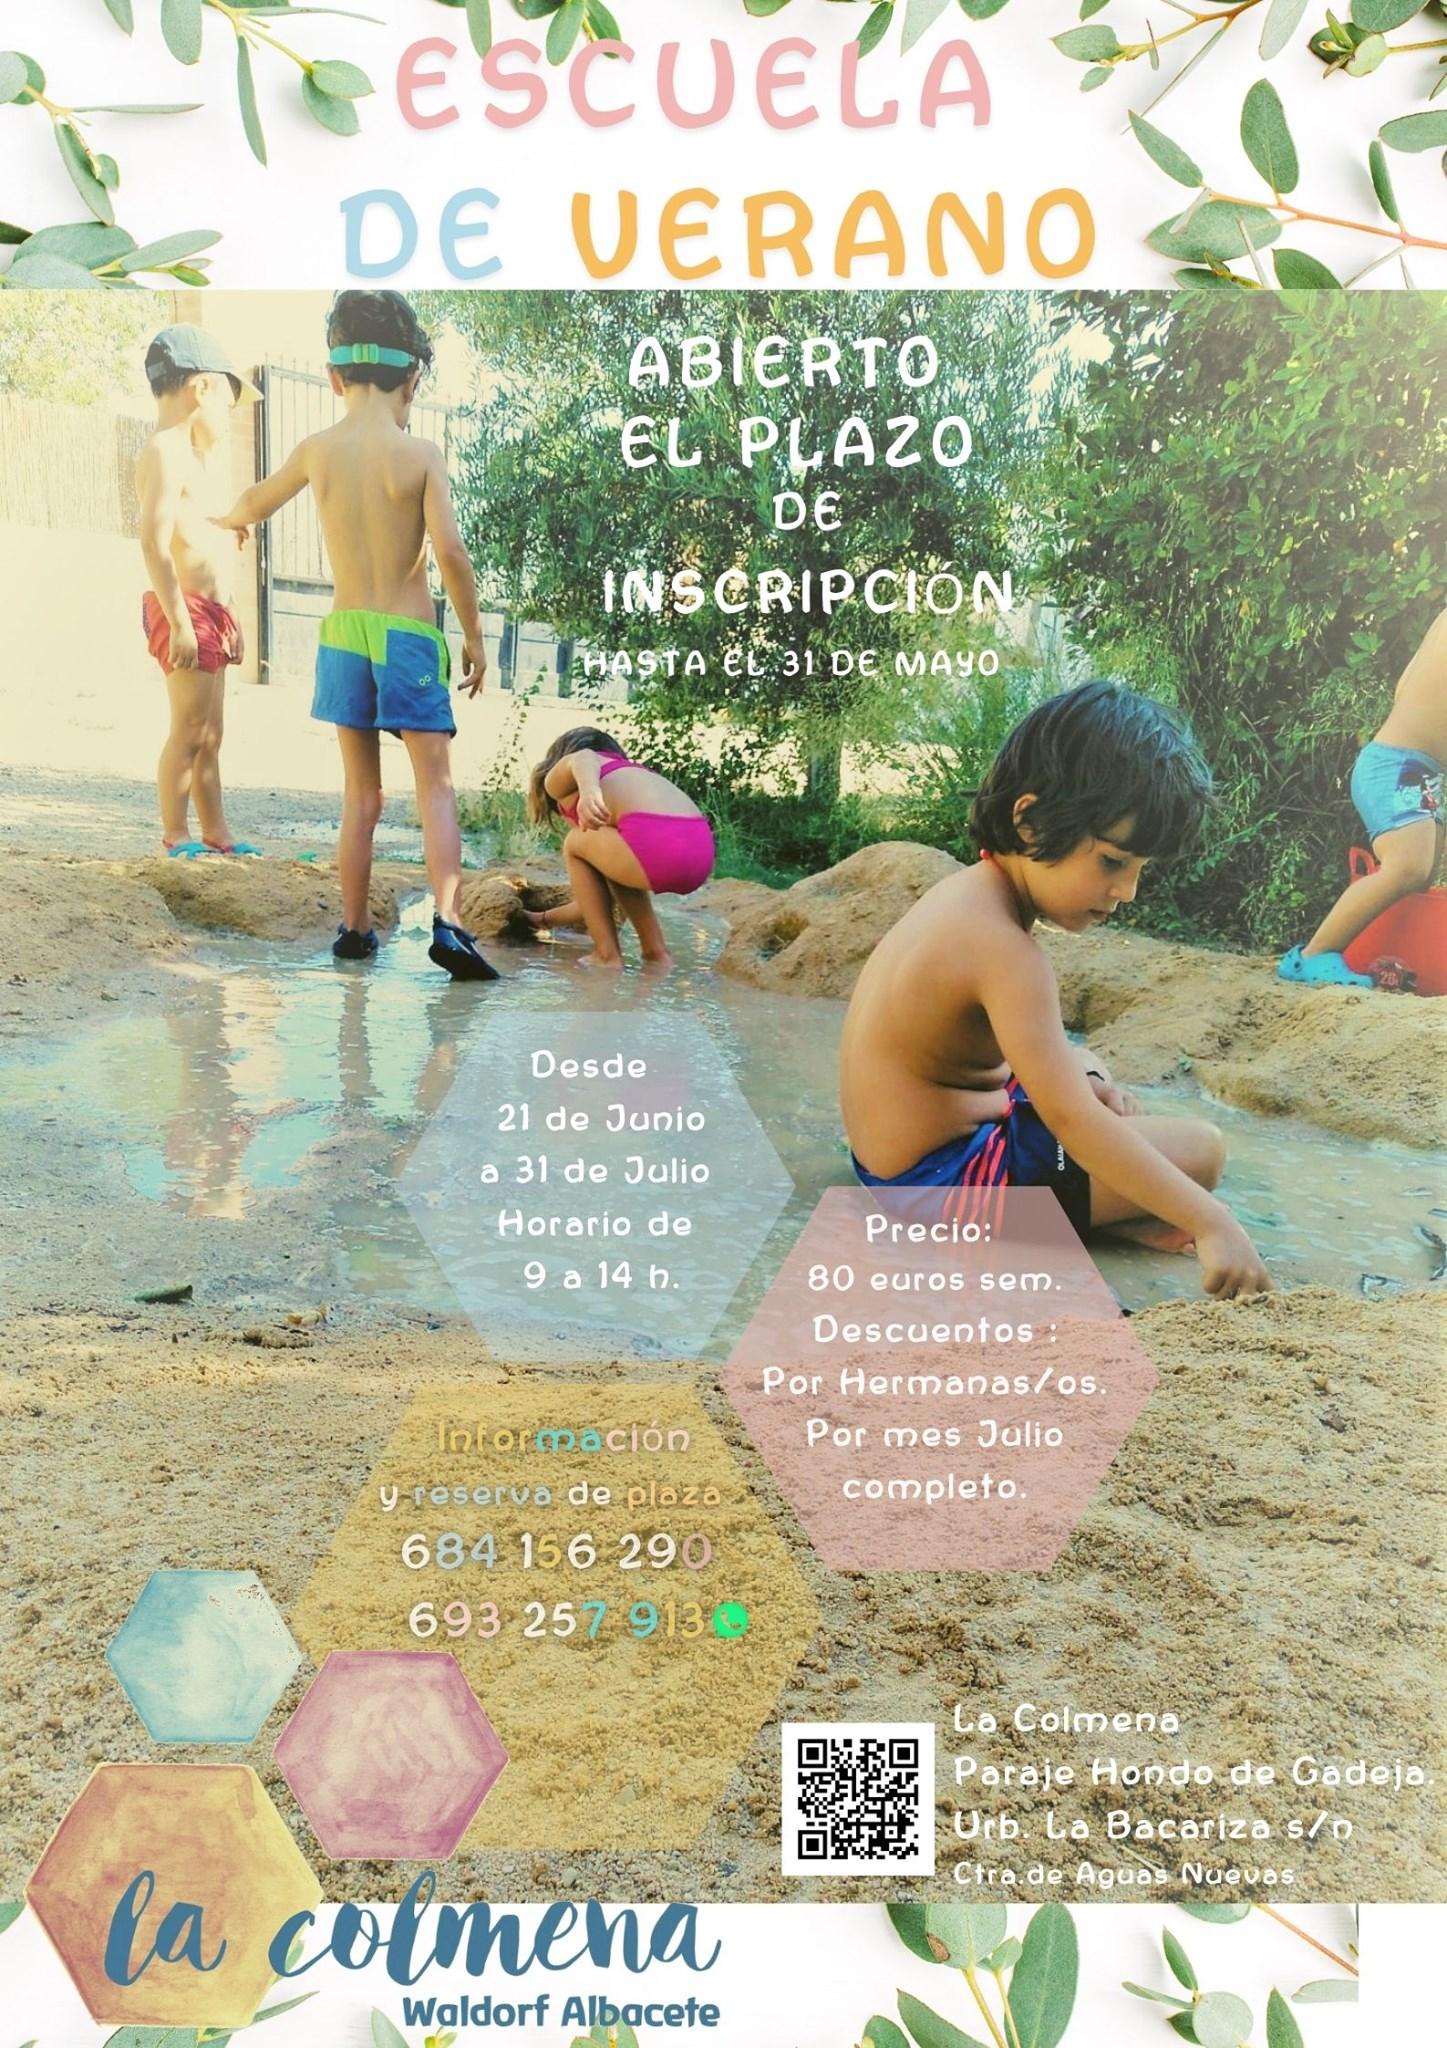 Escuela de verano 2021 - Waldorf Albacete La Colmena